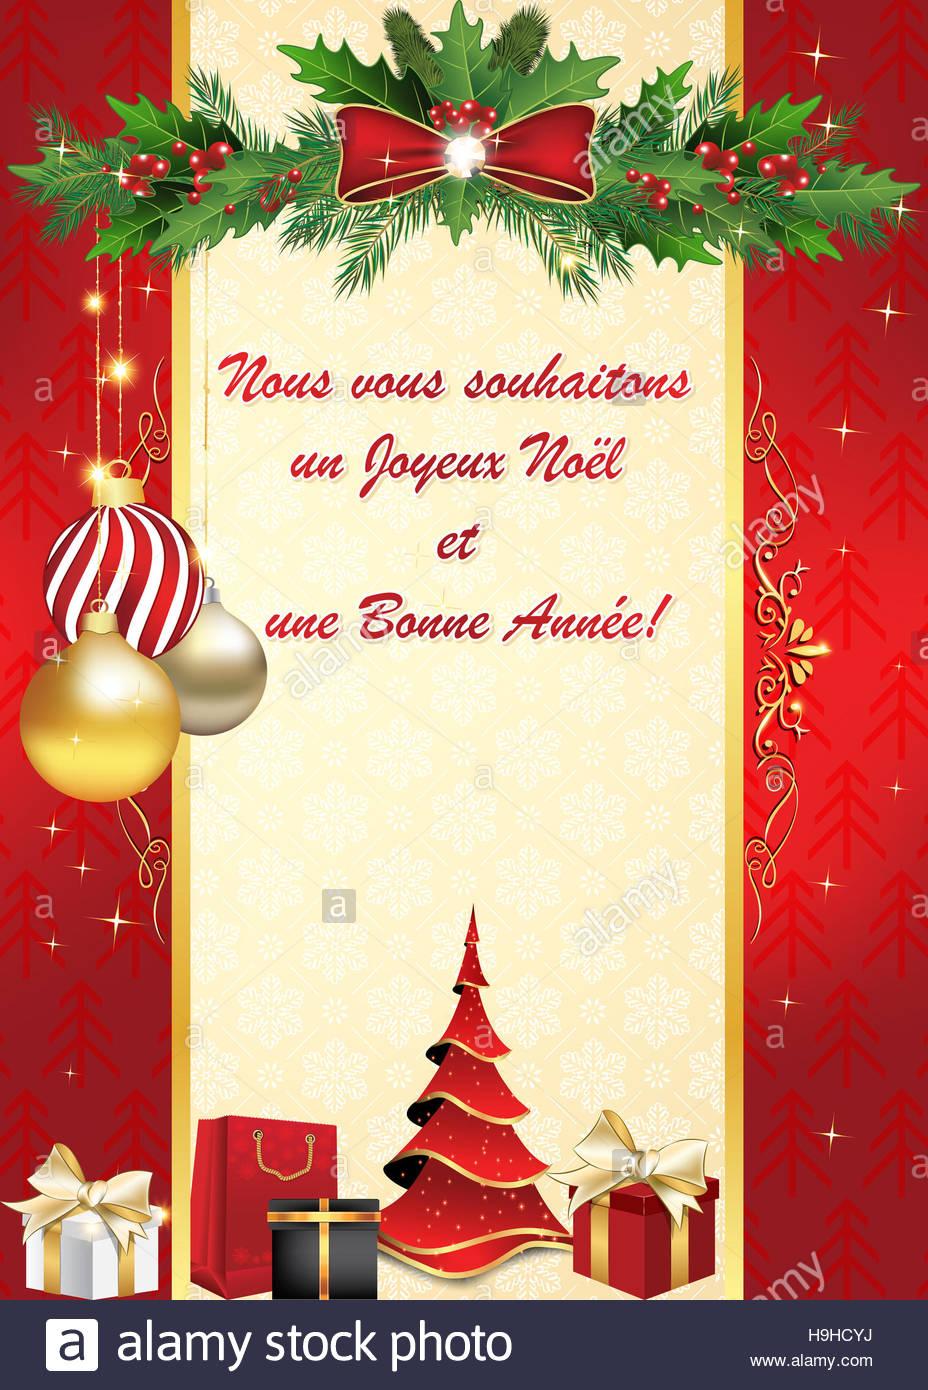 Photos De Joyeux Noel 2019.Joyeux Noel Et Bonne Annee 2019 La France Au Vanuatu